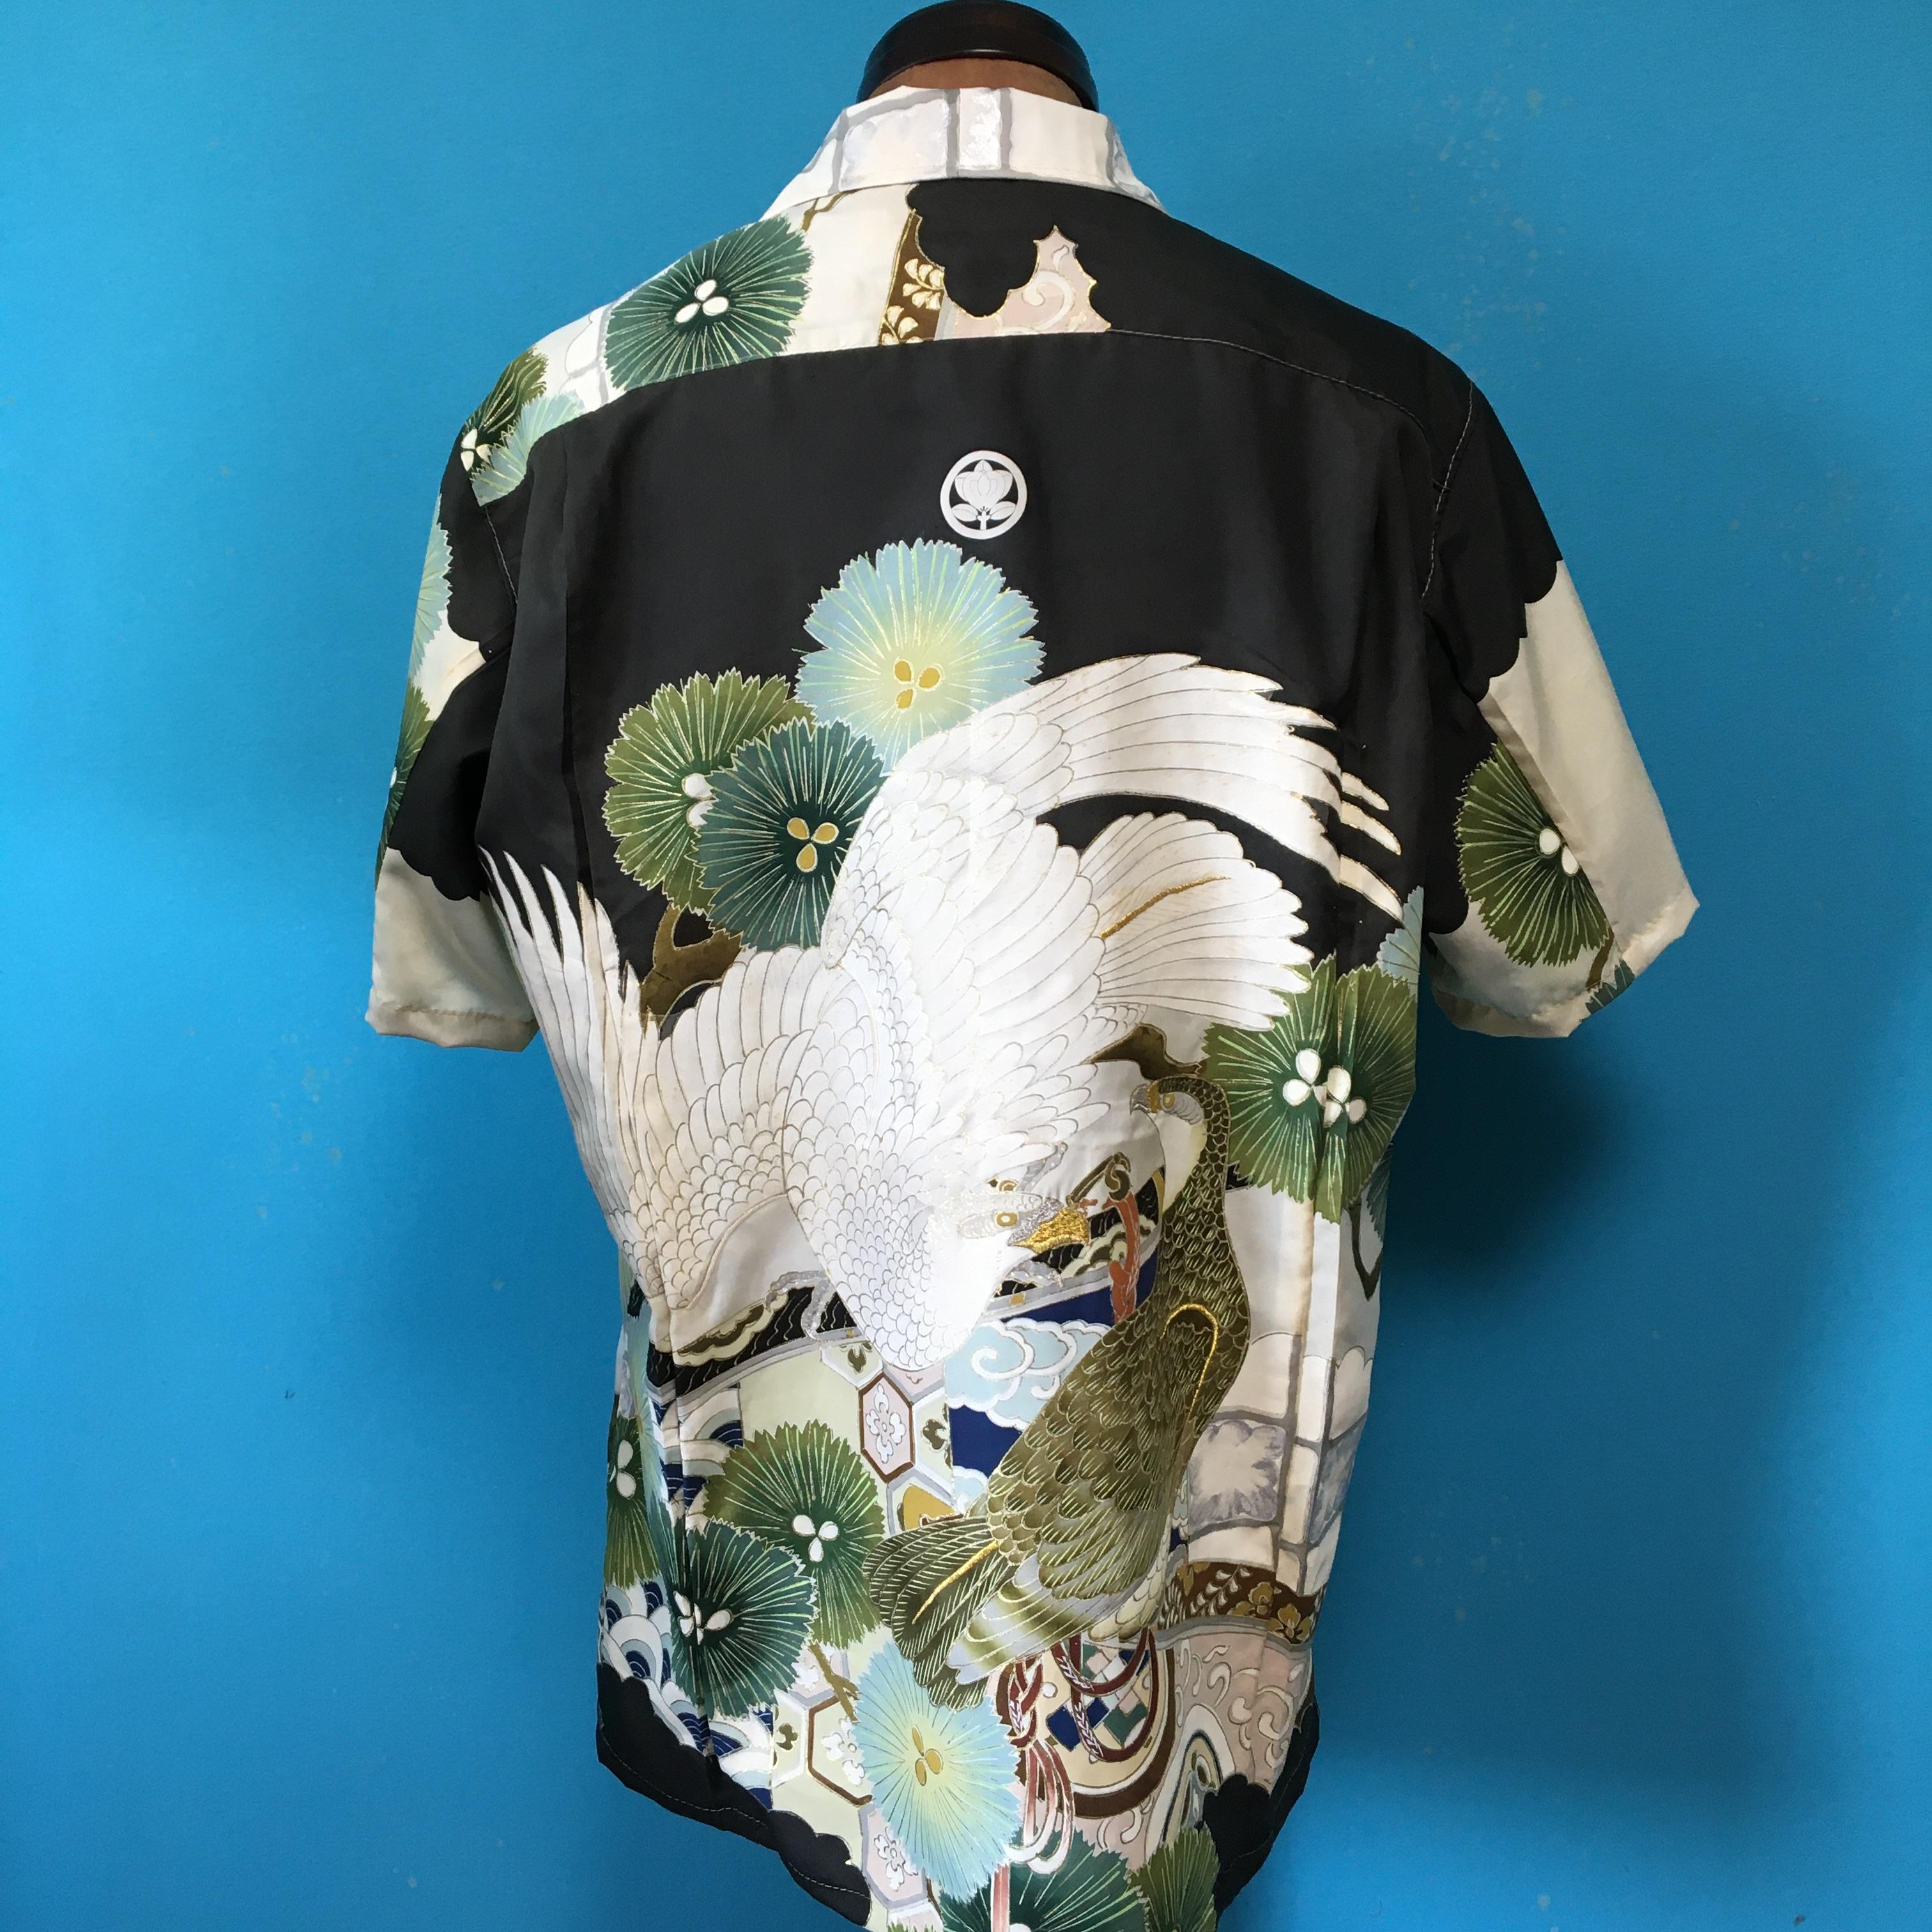 Vintage正絹産着のアロハ 鷹 US M